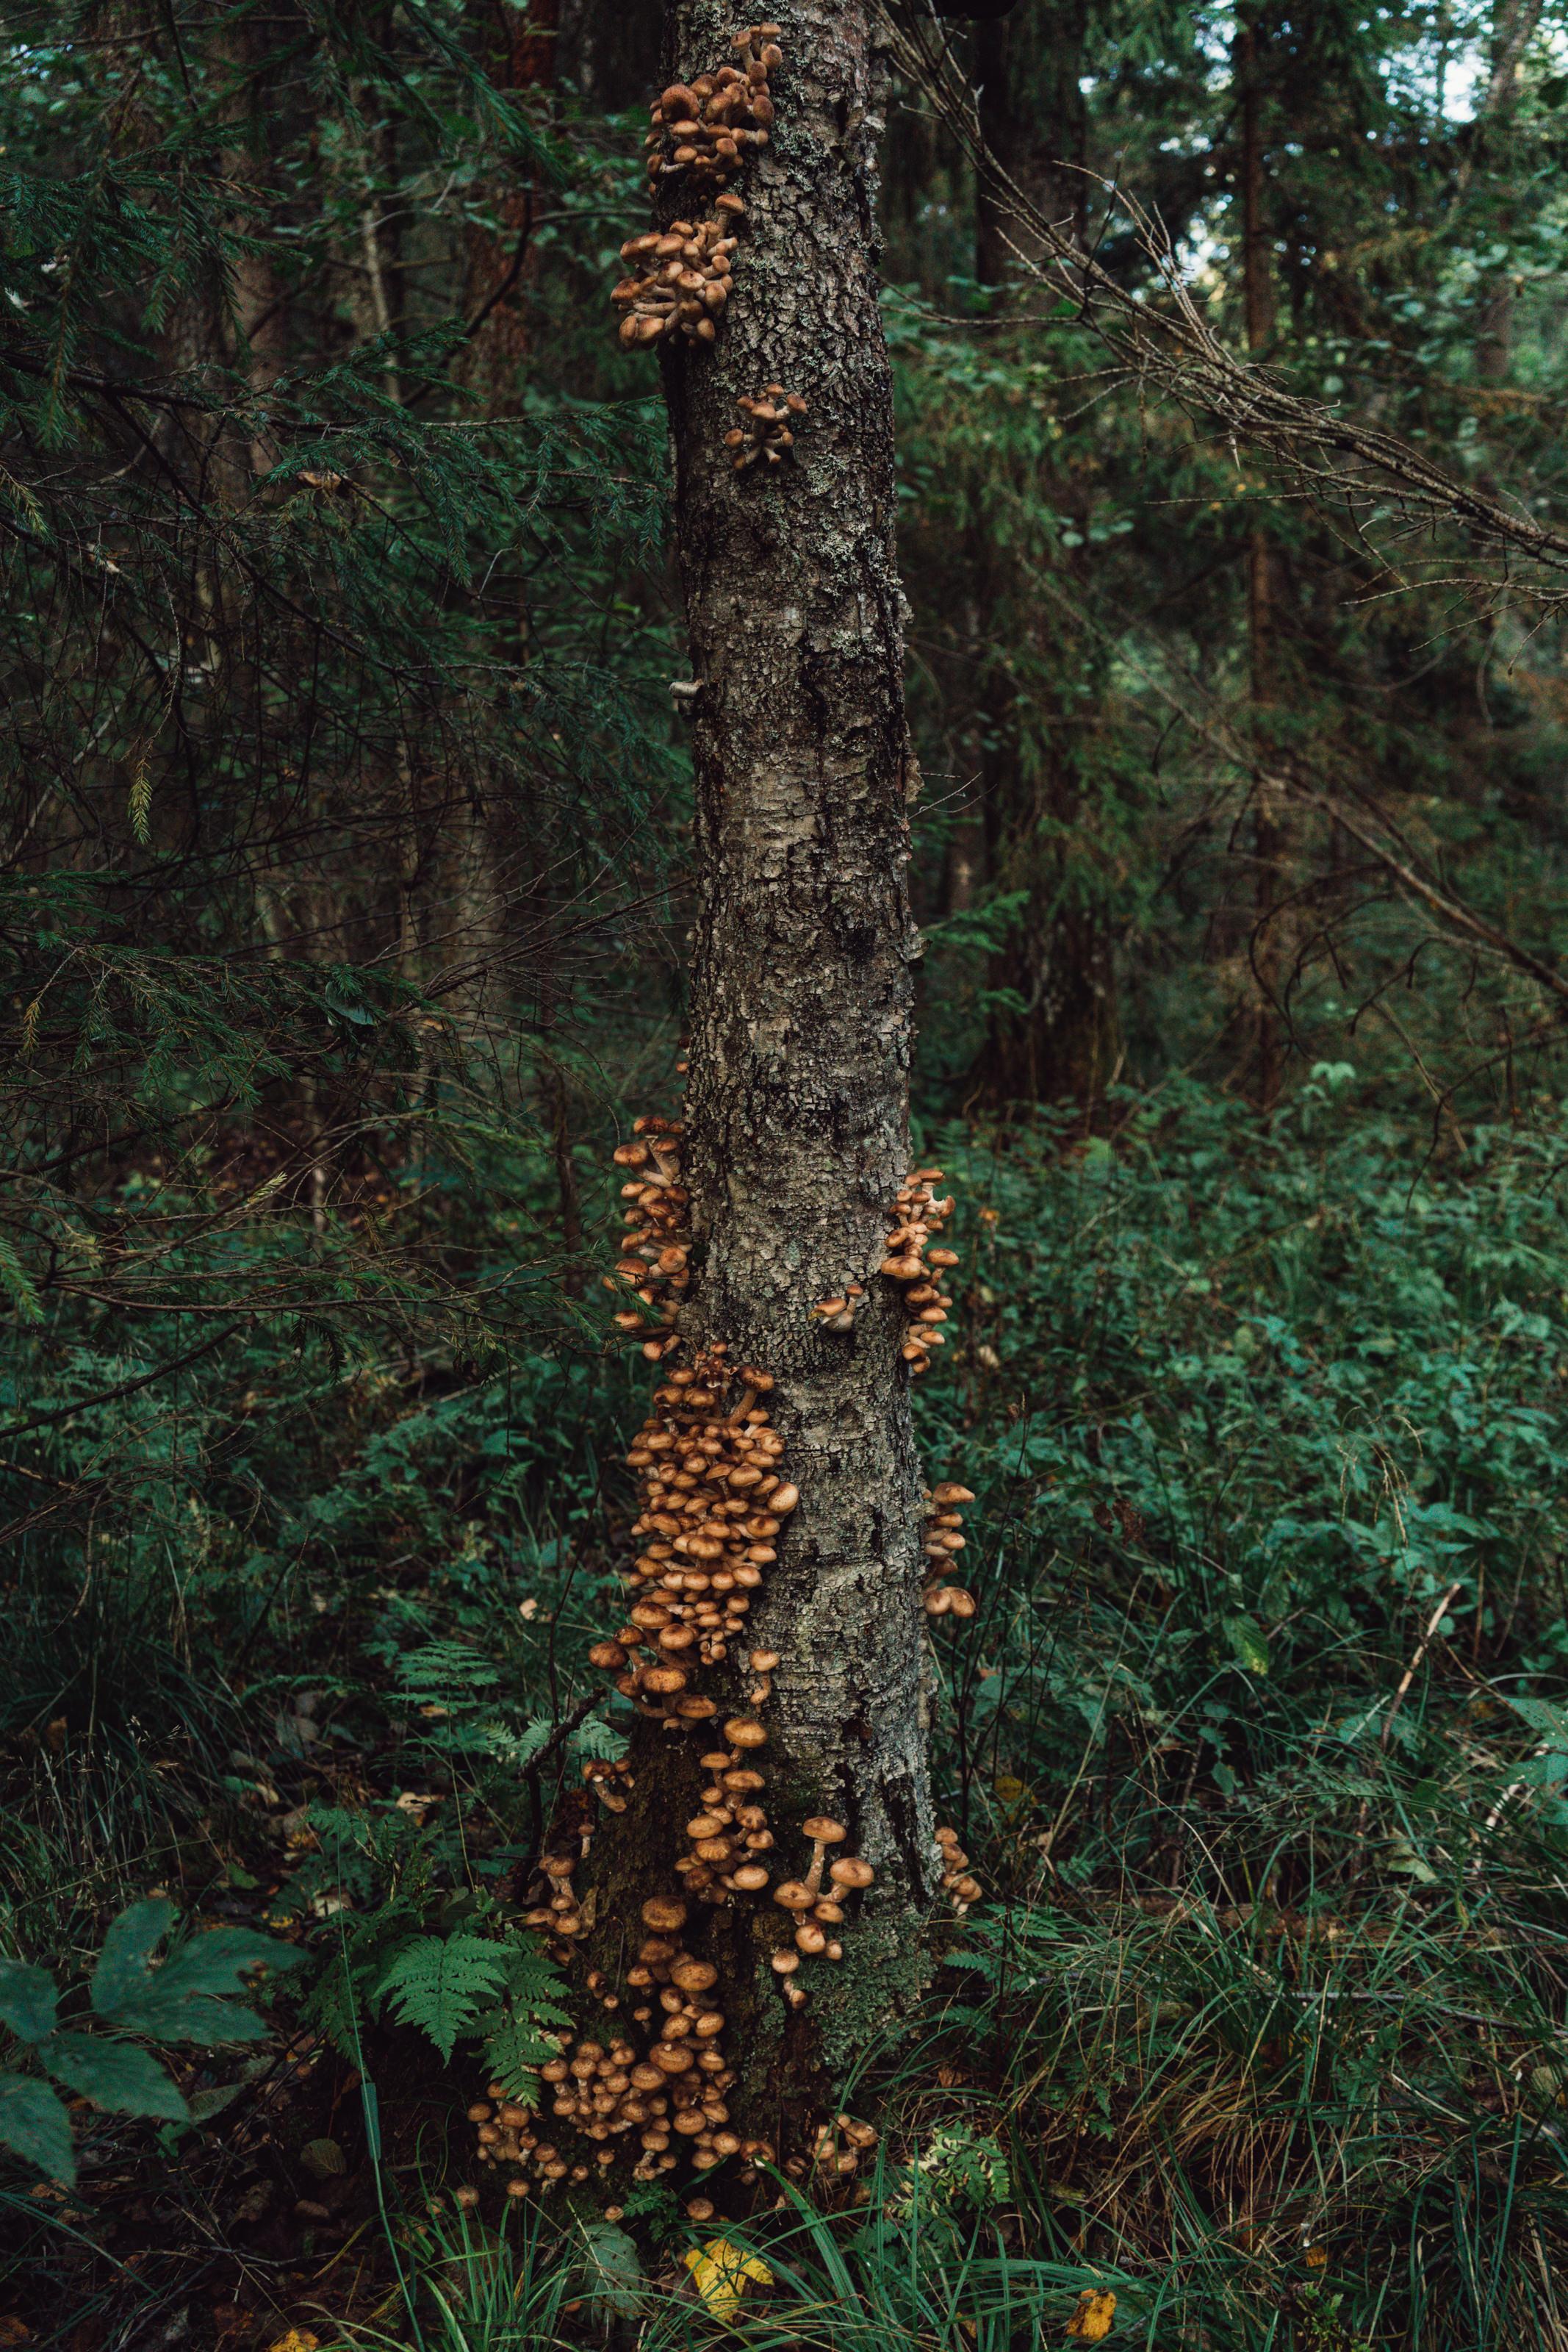 Honey Mushrooms on a decaying birch.